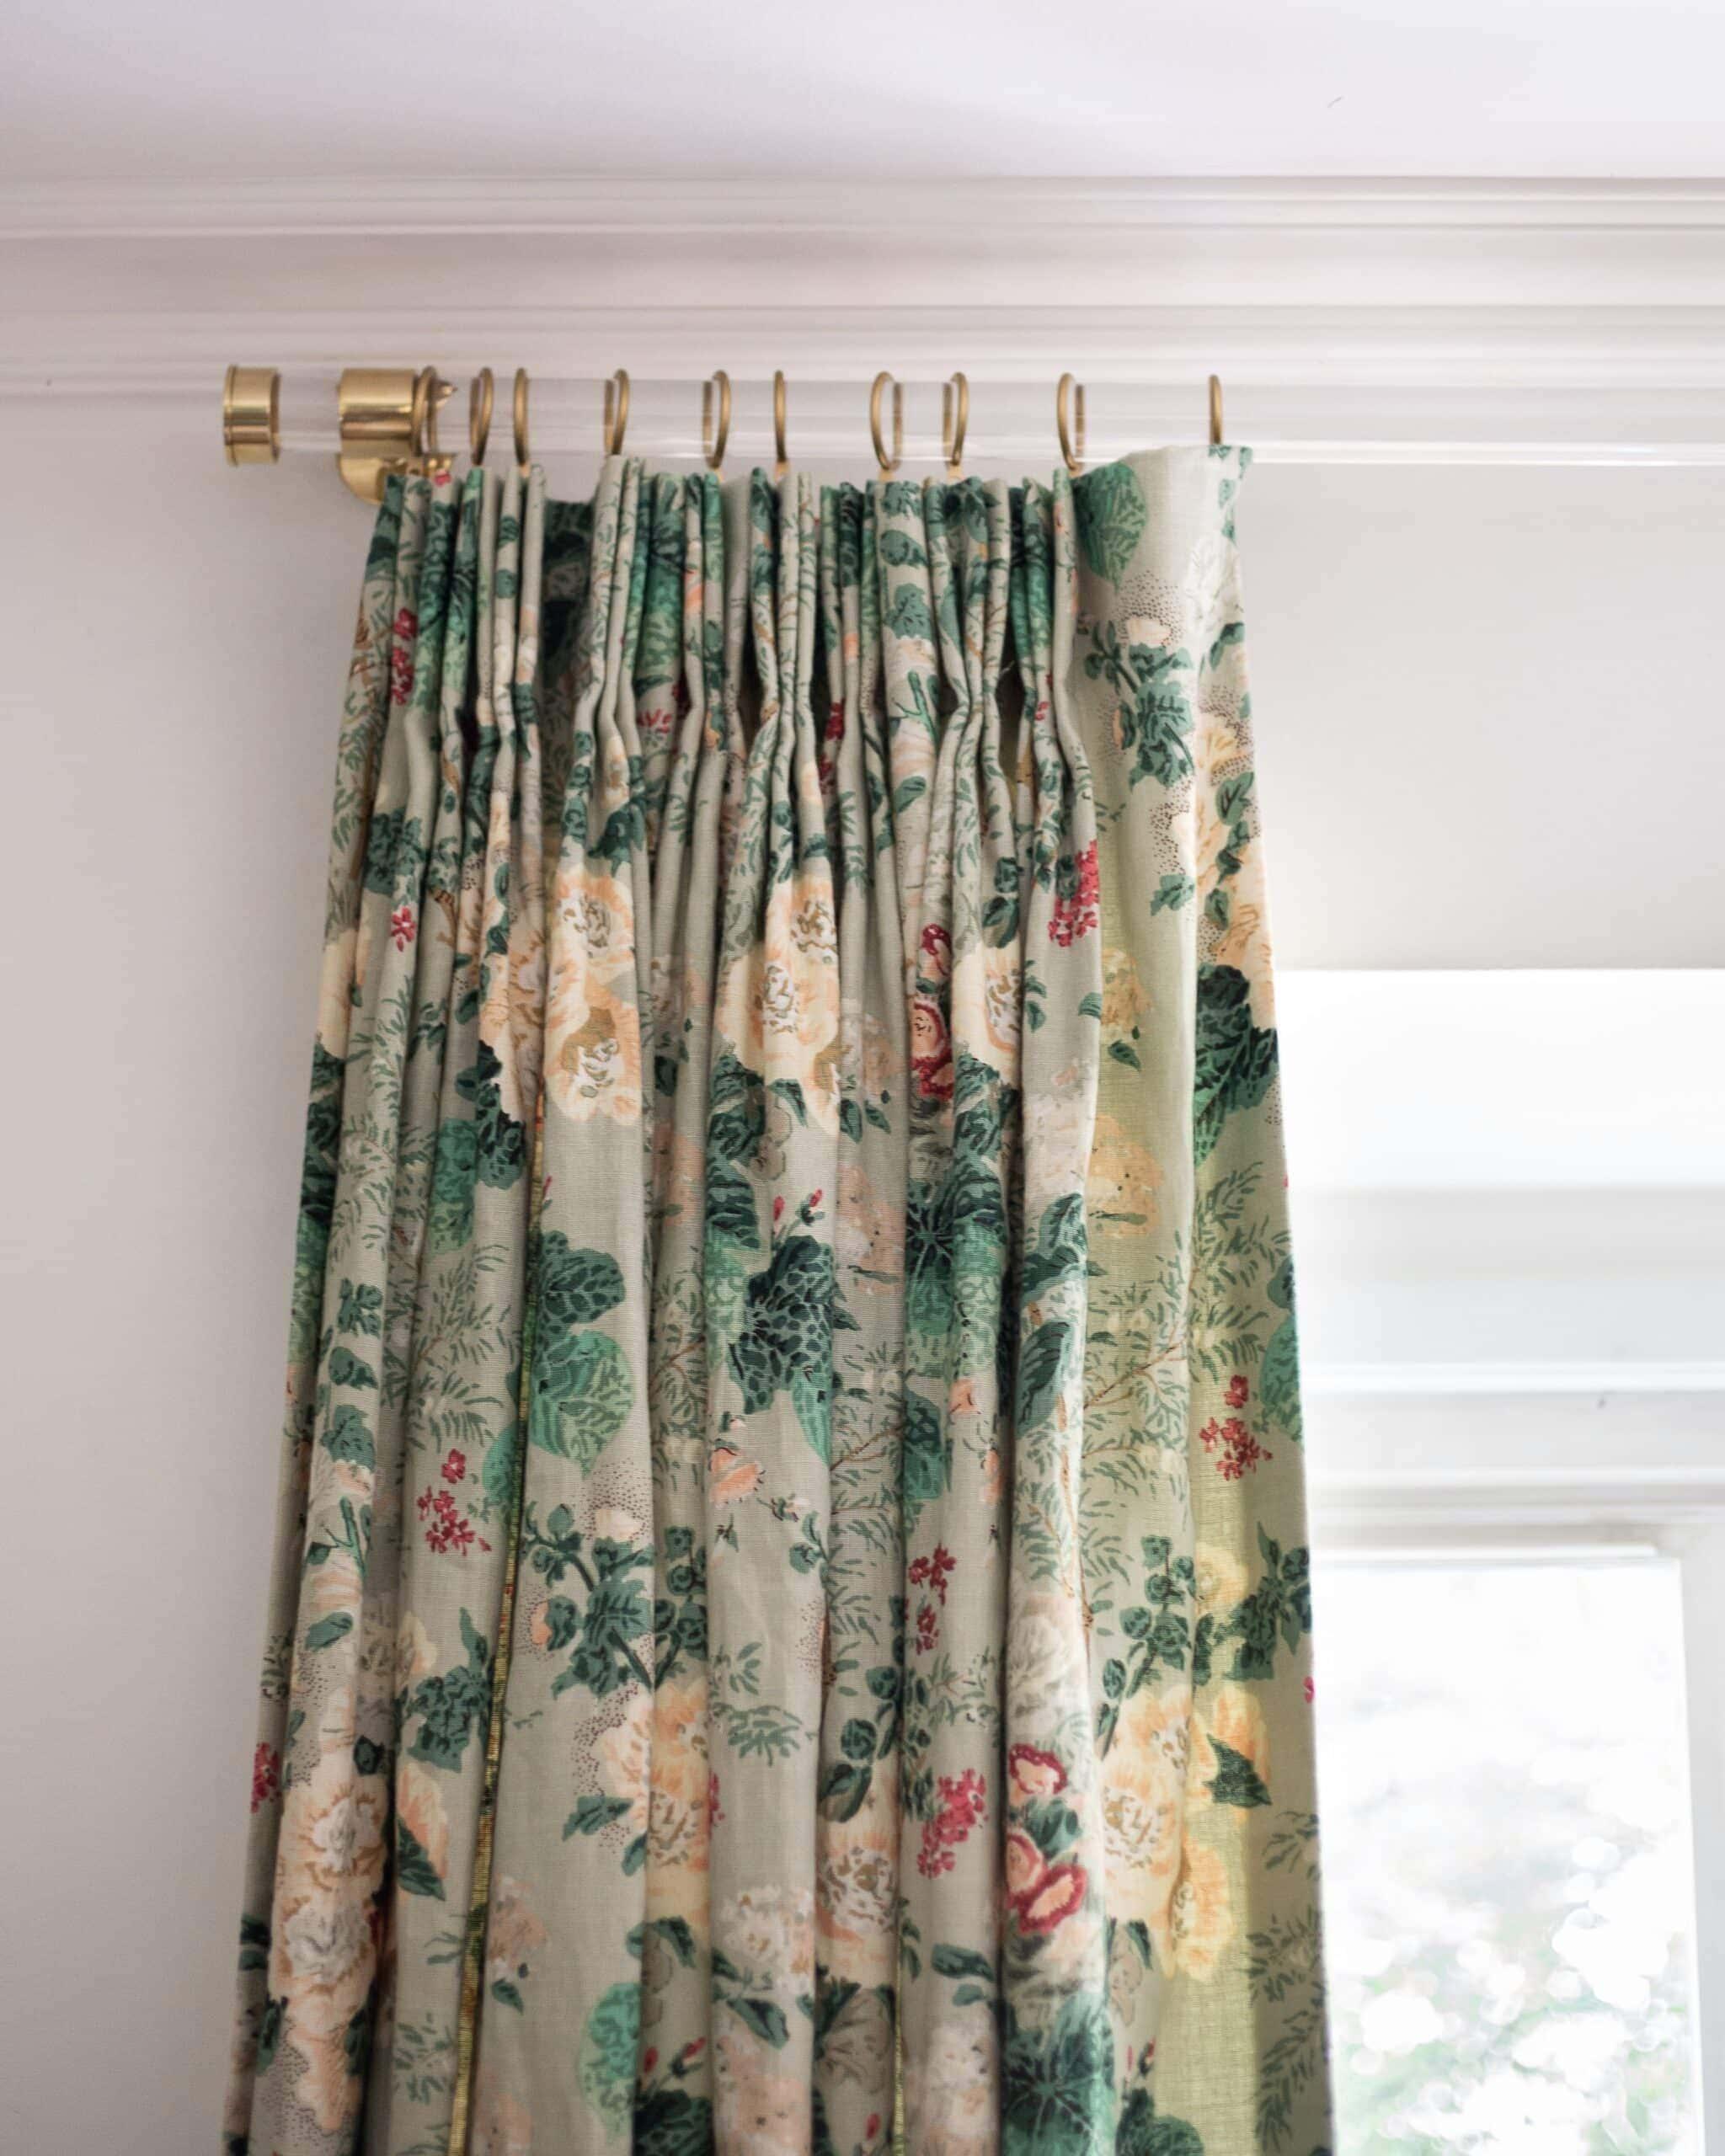 custom-drapery-lucite-brass-curtain-rod